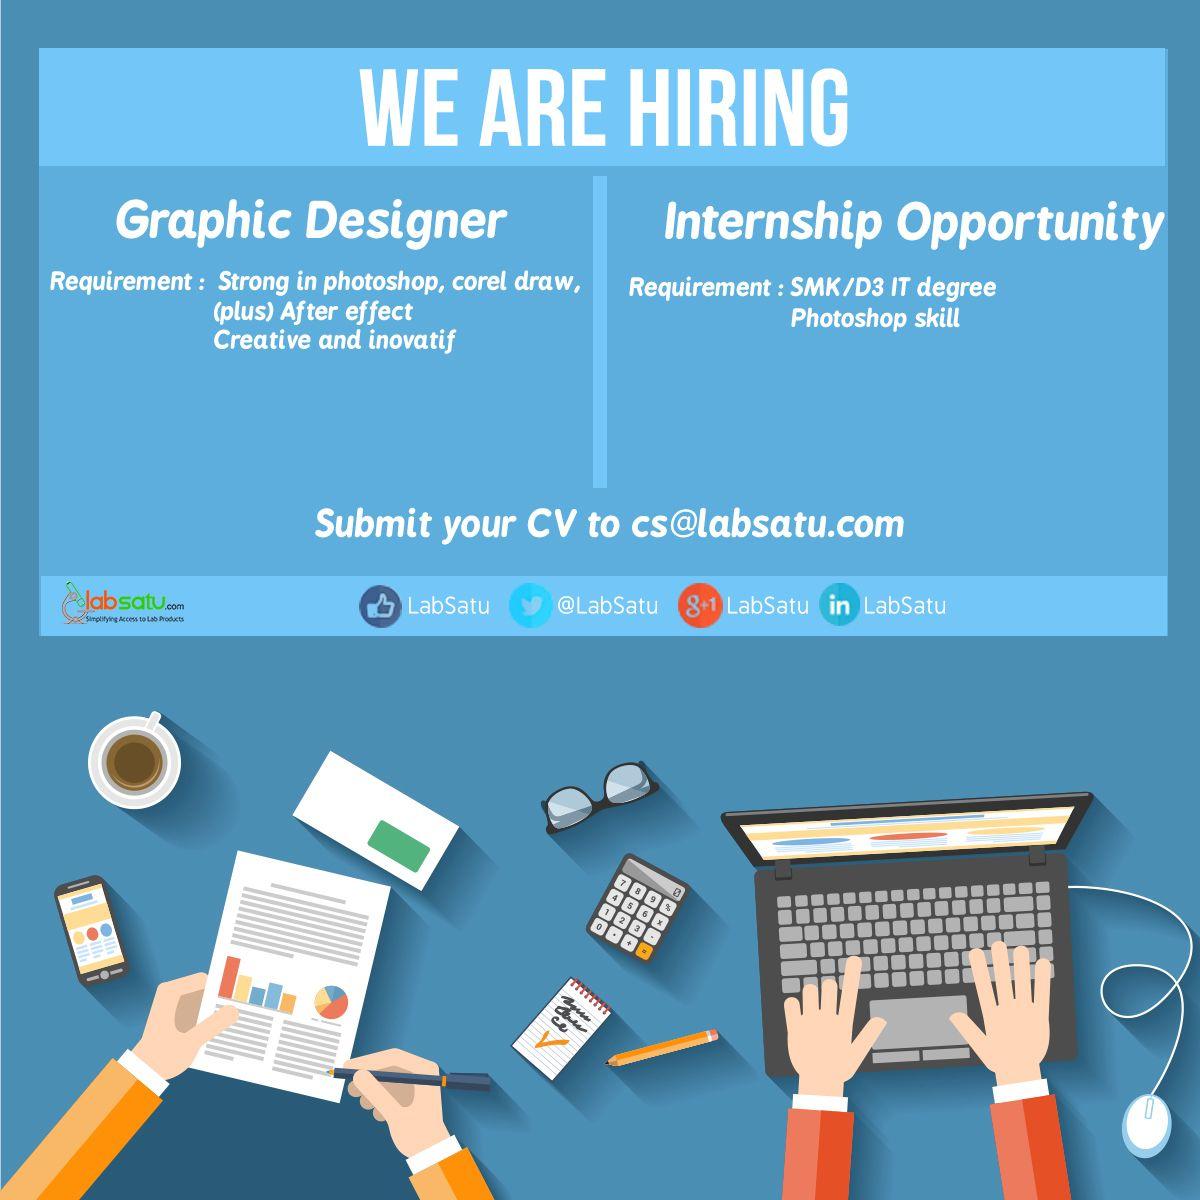 Info Lowongan Kerja Dicari Graphic Designer Internship Opportunity Programmer Web Designer Share Ke Sahabat Terdekatmu Ya Siapa T Tahu Sahabat